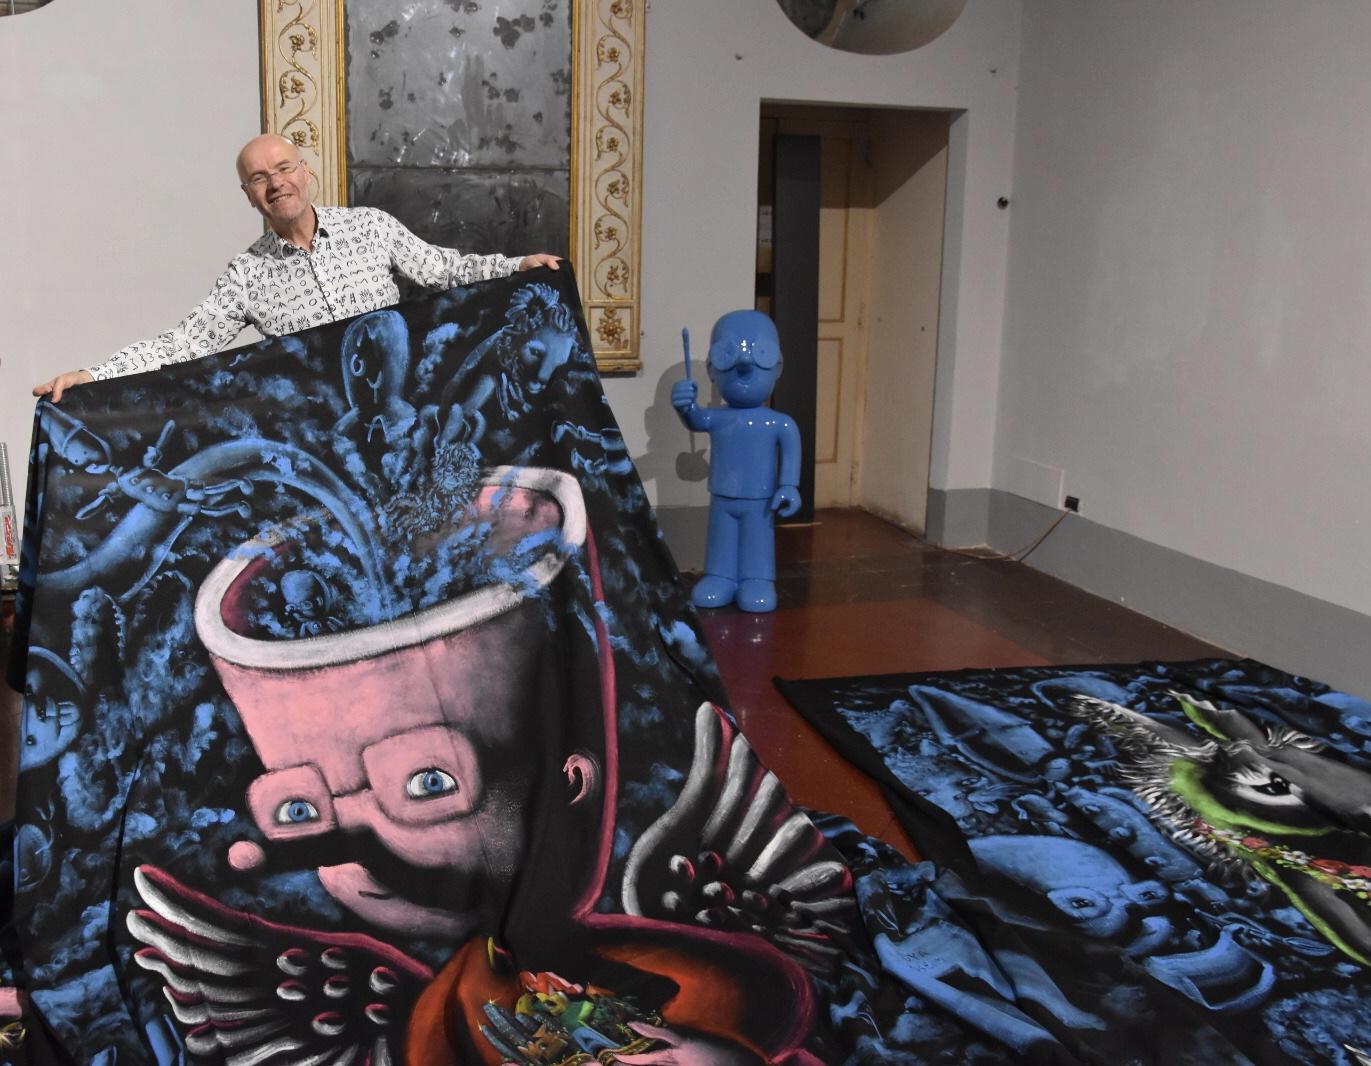 Moya Royal Transmedia, la mostra dell'artista francese Patrick Moya alla Reggia di Caserta